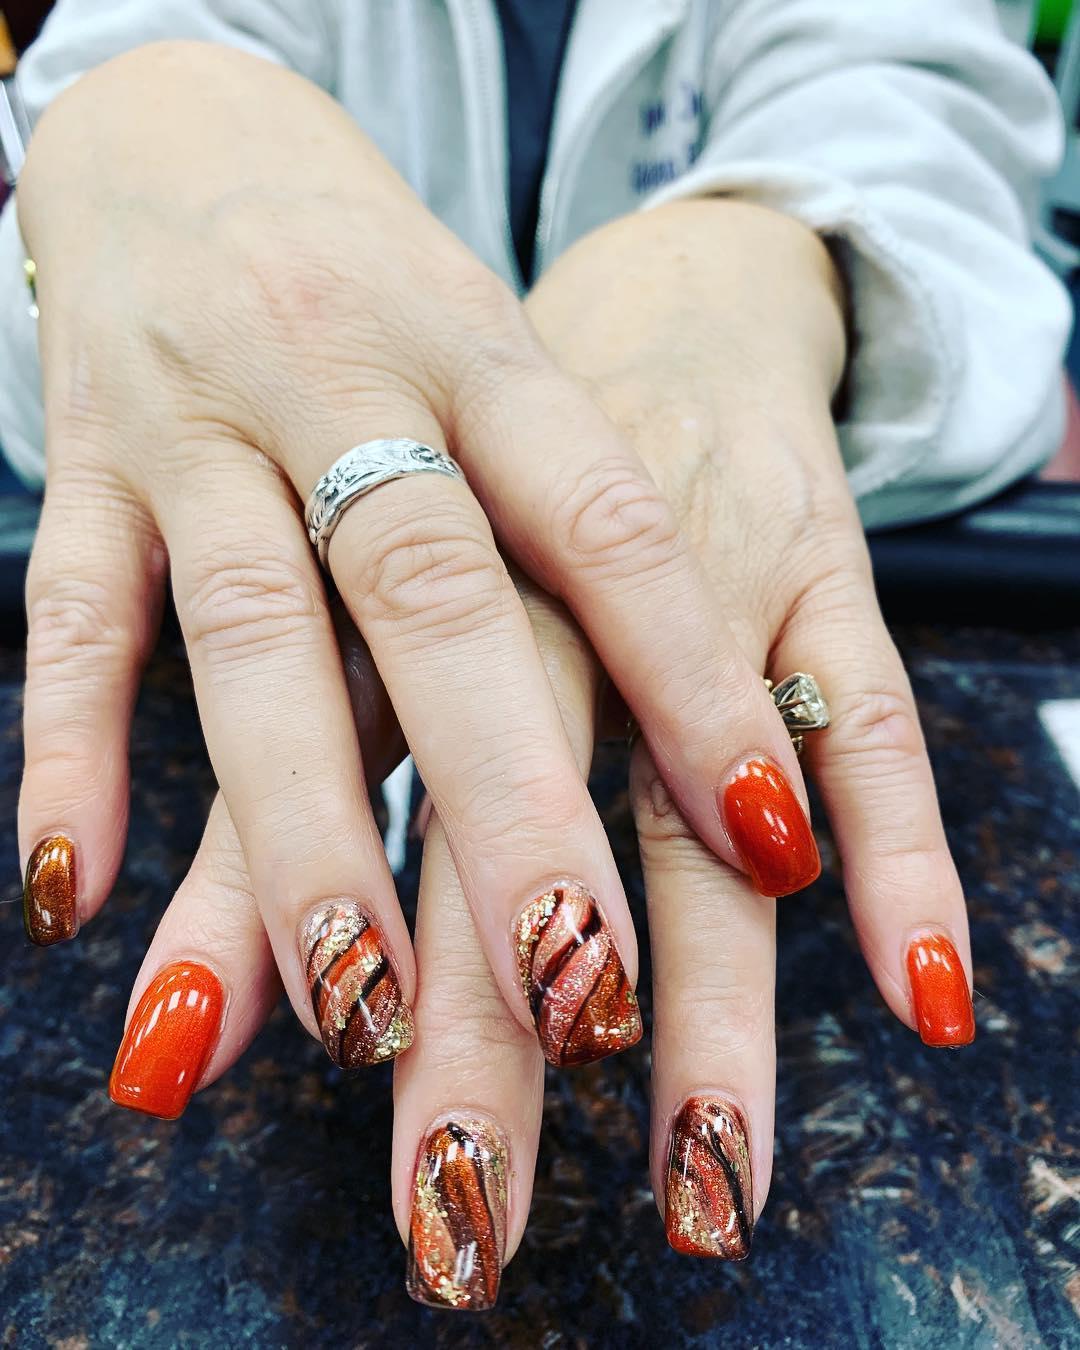 simple flower nail design ideas 2019 12 - 24 Simple Flower Nail Design Ideas 2019